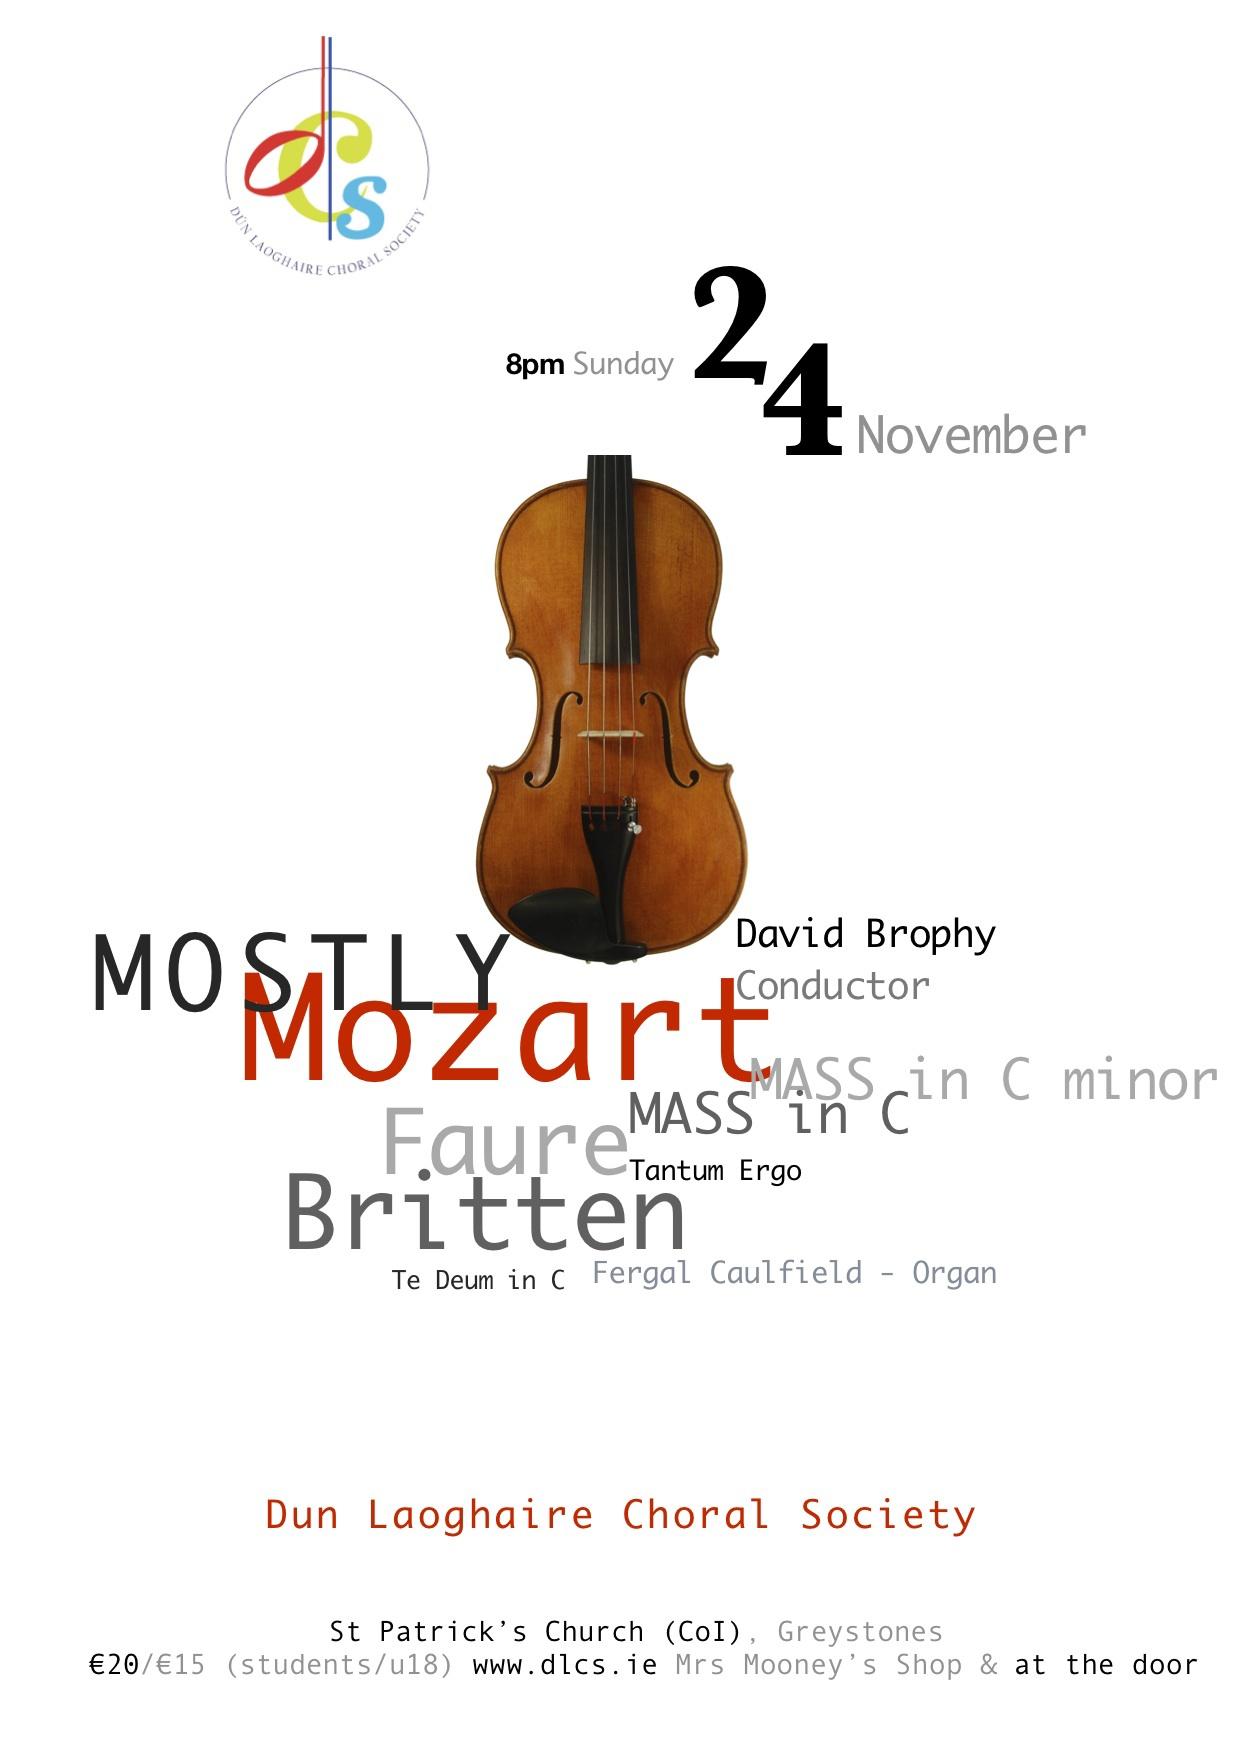 'Mostly Mozart', Greystones, 24th November 2013